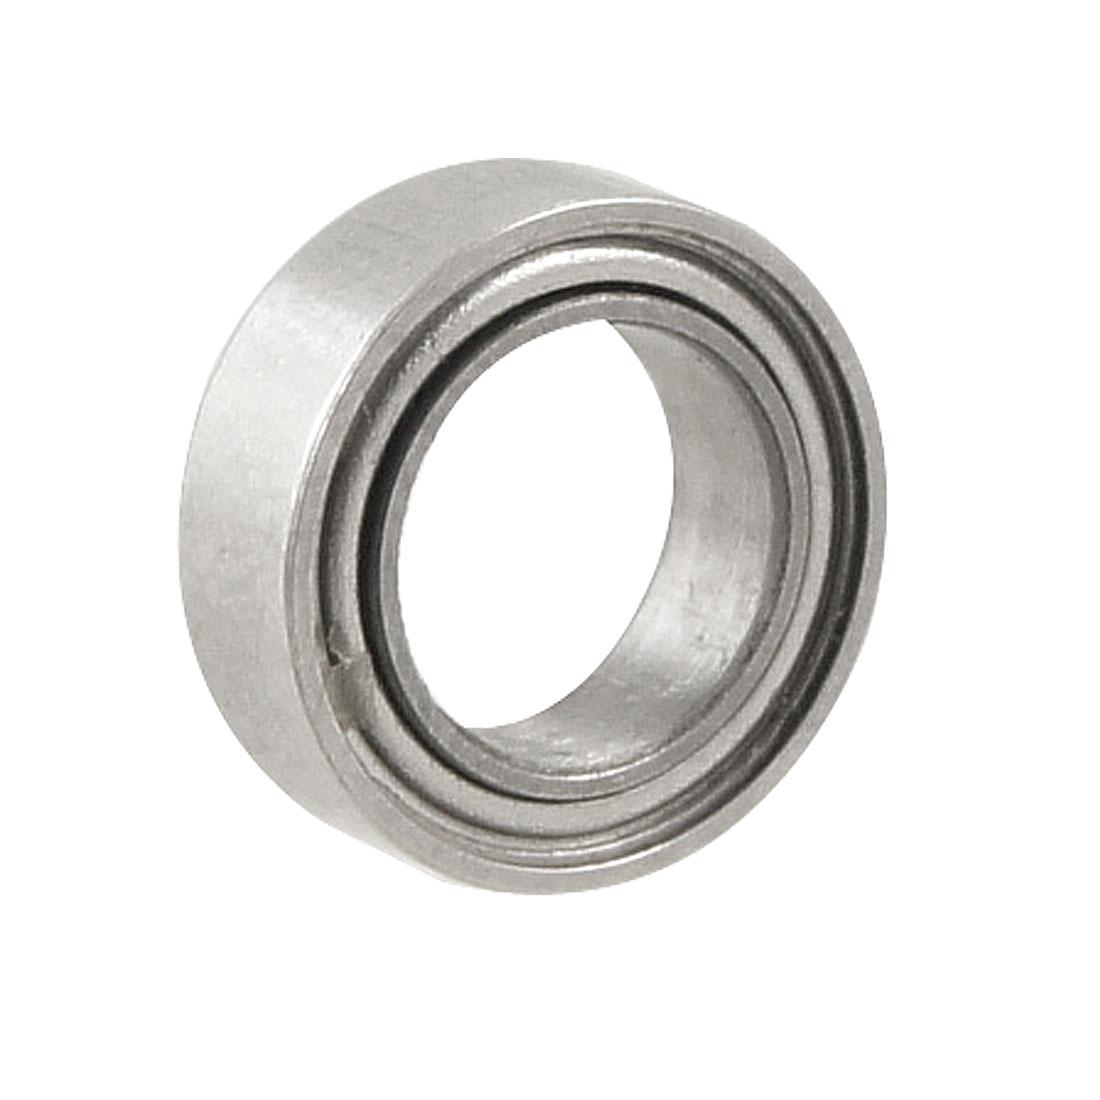 Silver Tone Metal 8mm x 5mm x 2.5mm Shield Ball Bearing